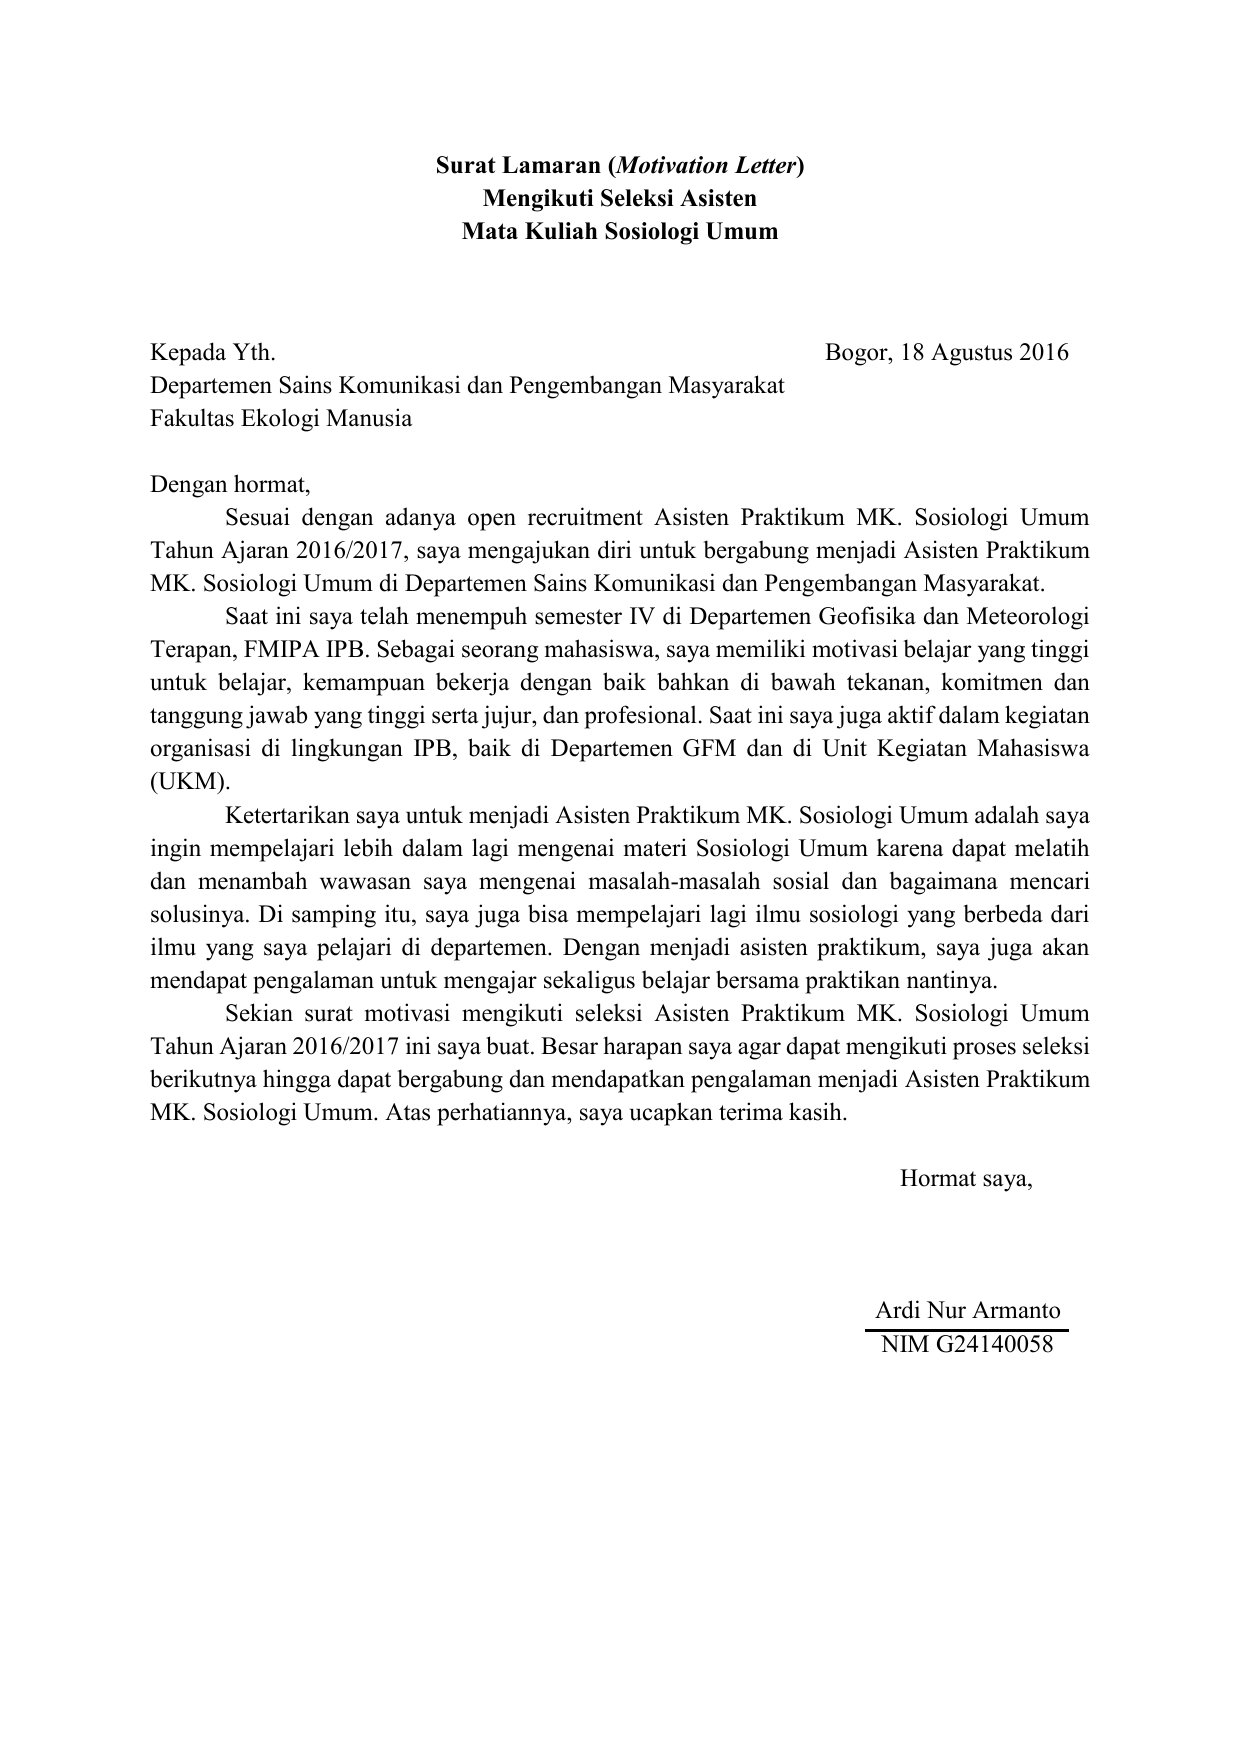 Contoh Motivation Letter Seleksi